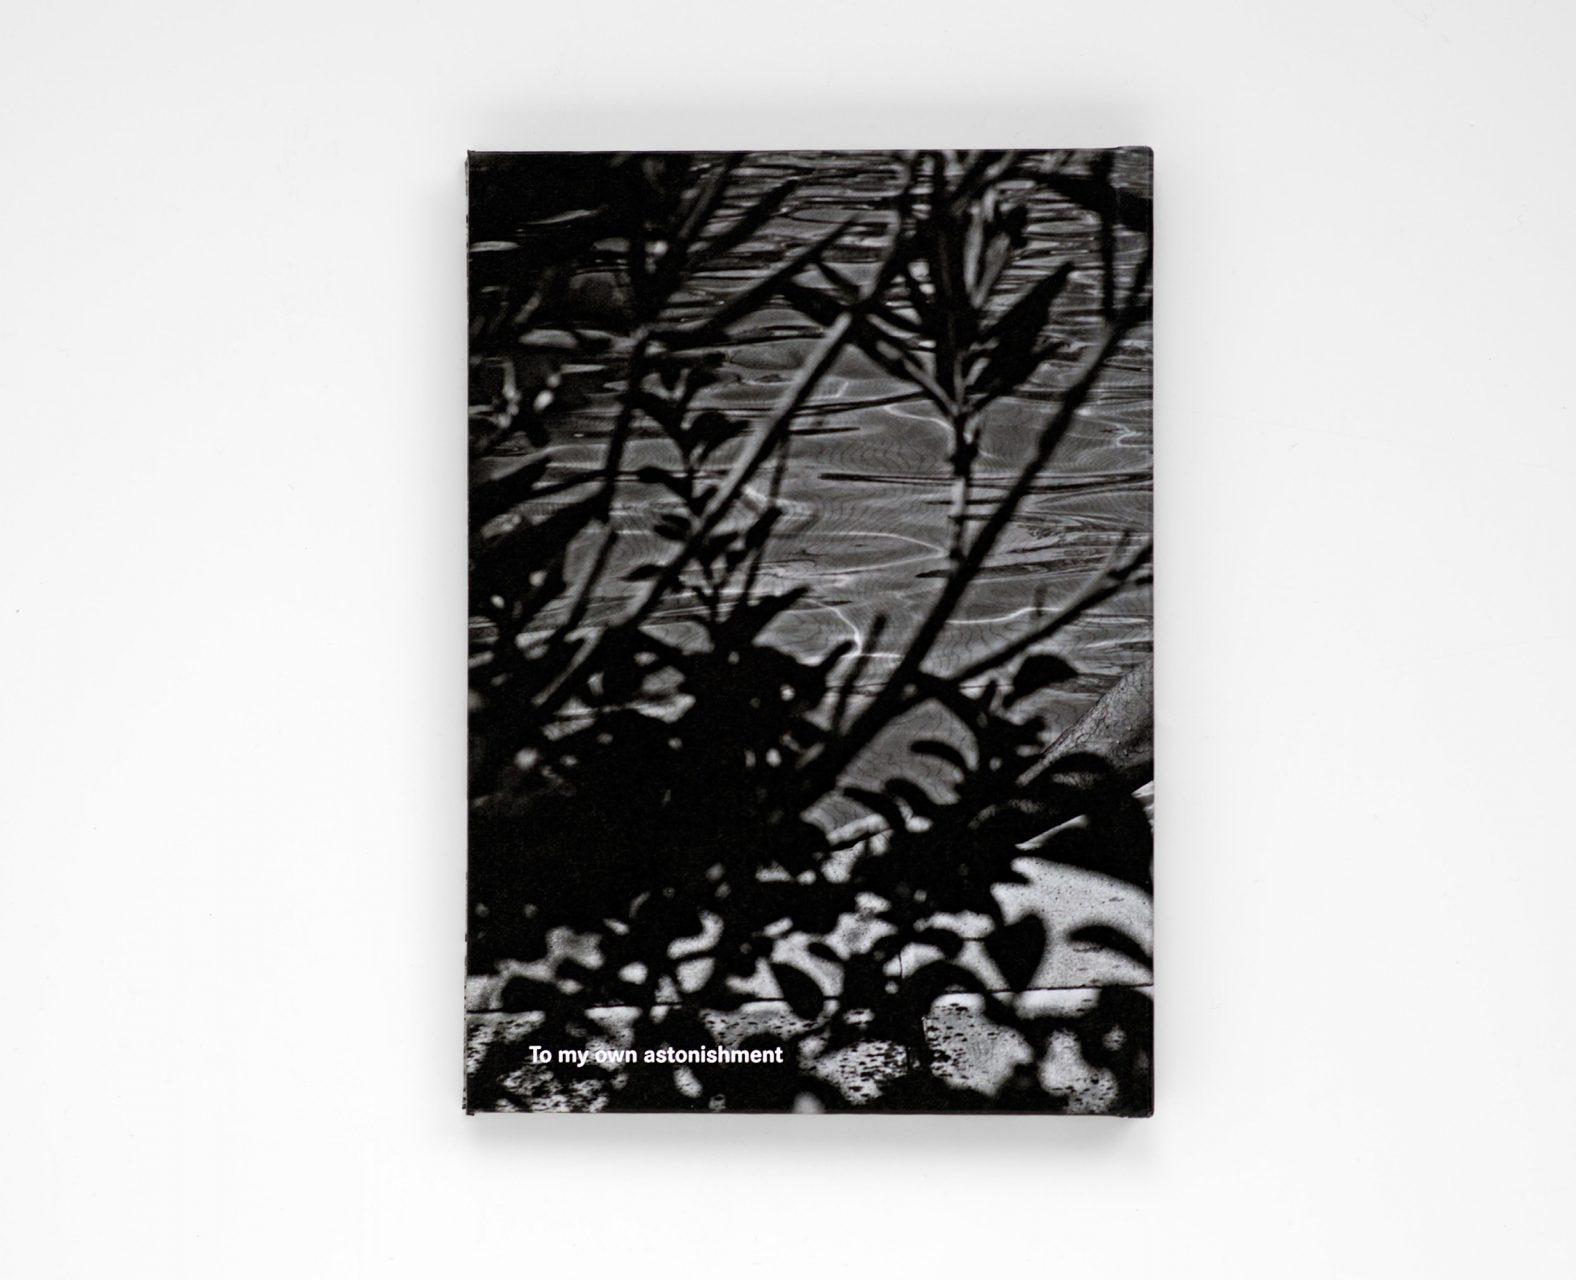 10_Buch-V_SFS9484_master-160